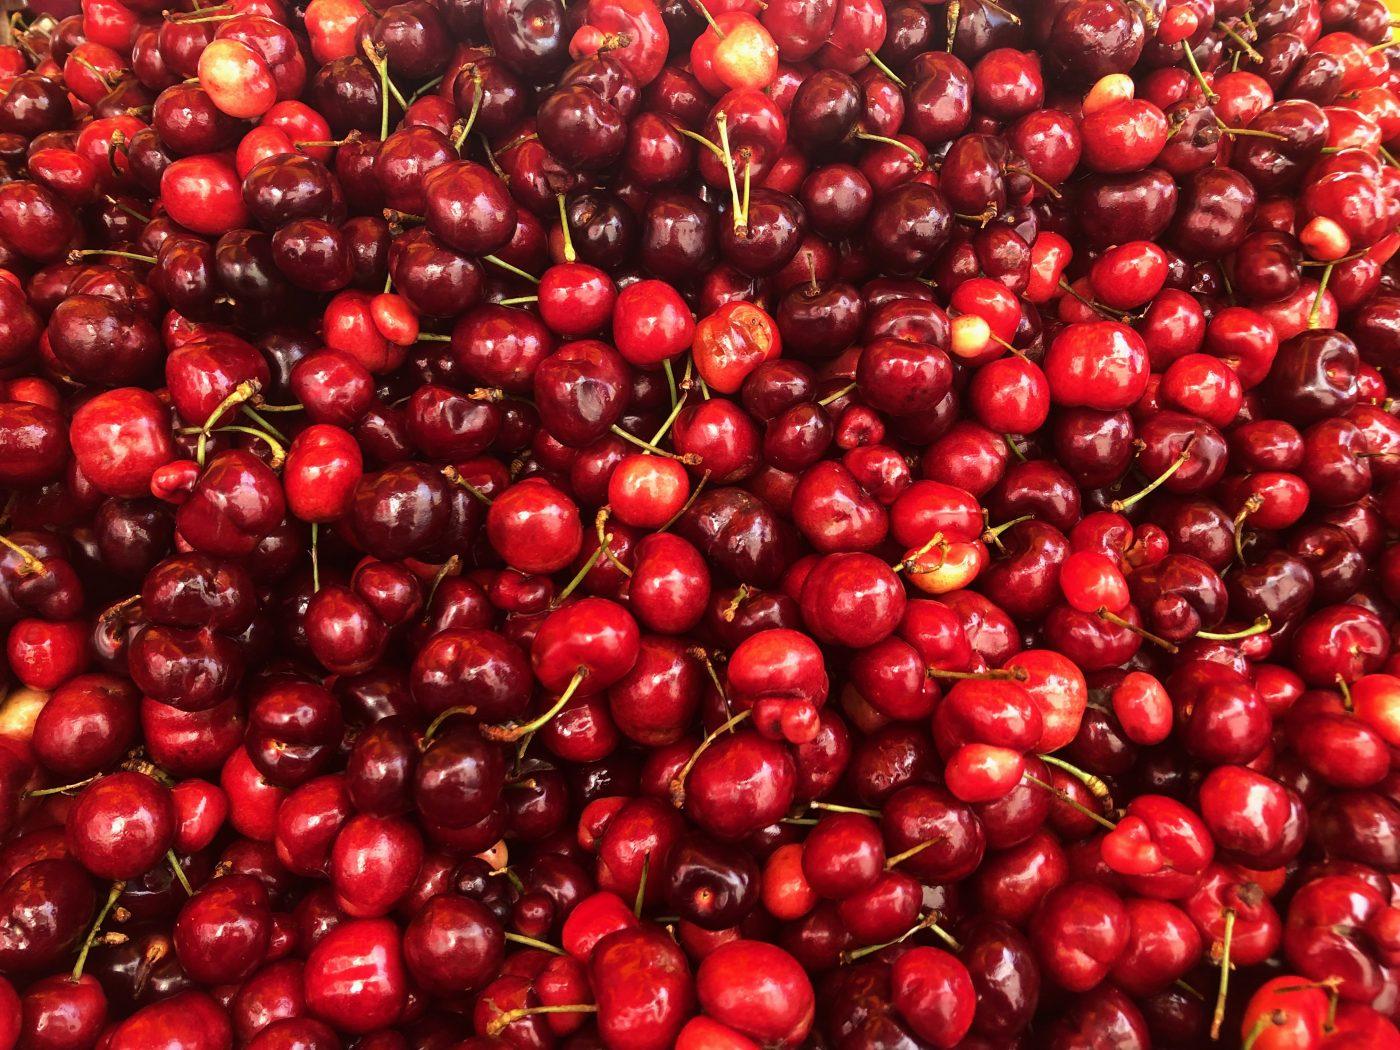 29 August 2019 Posted. Bing Cherries, Photograph taken by Hannah Baek. 冰樱,照片由MOCA实习生Hannah Baek拍摄